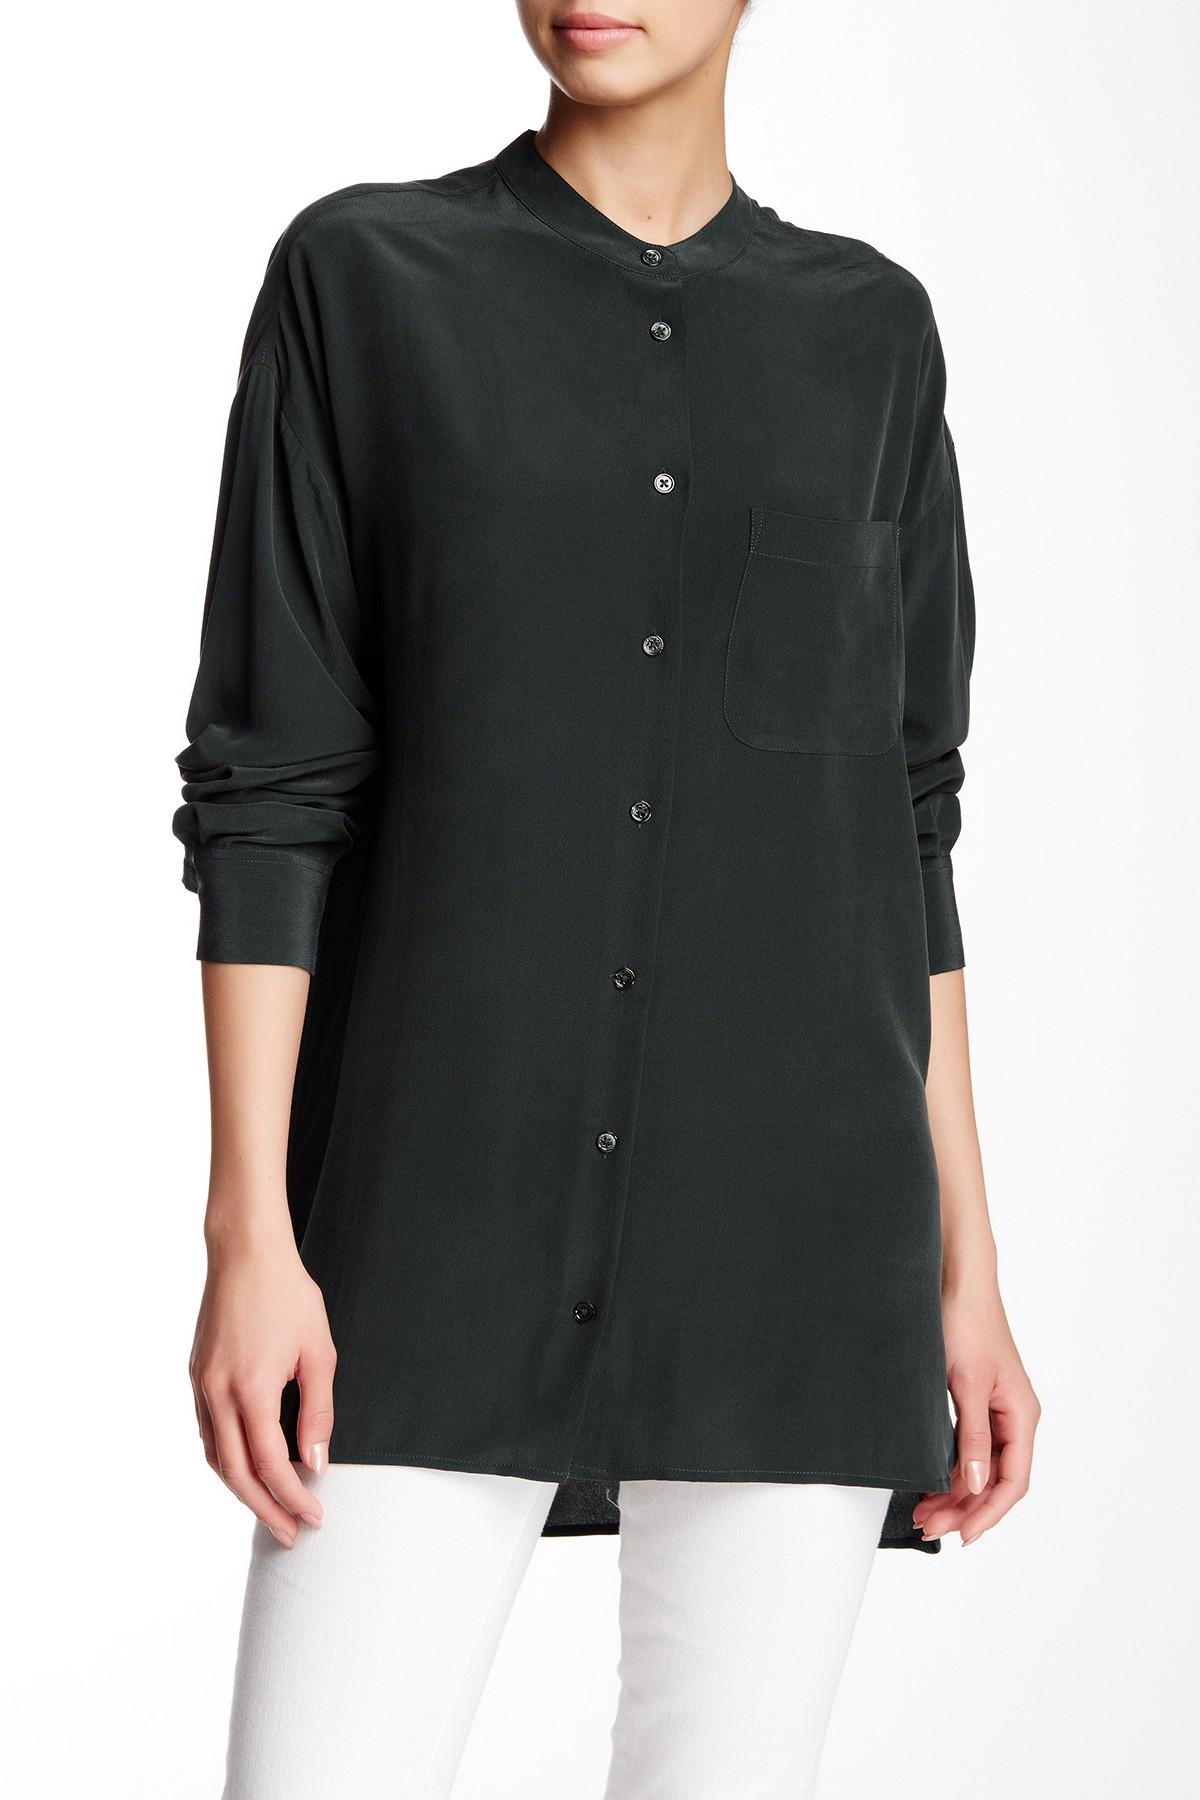 Lyst equipment melodie silk blouse in black for Equipment black silk shirt